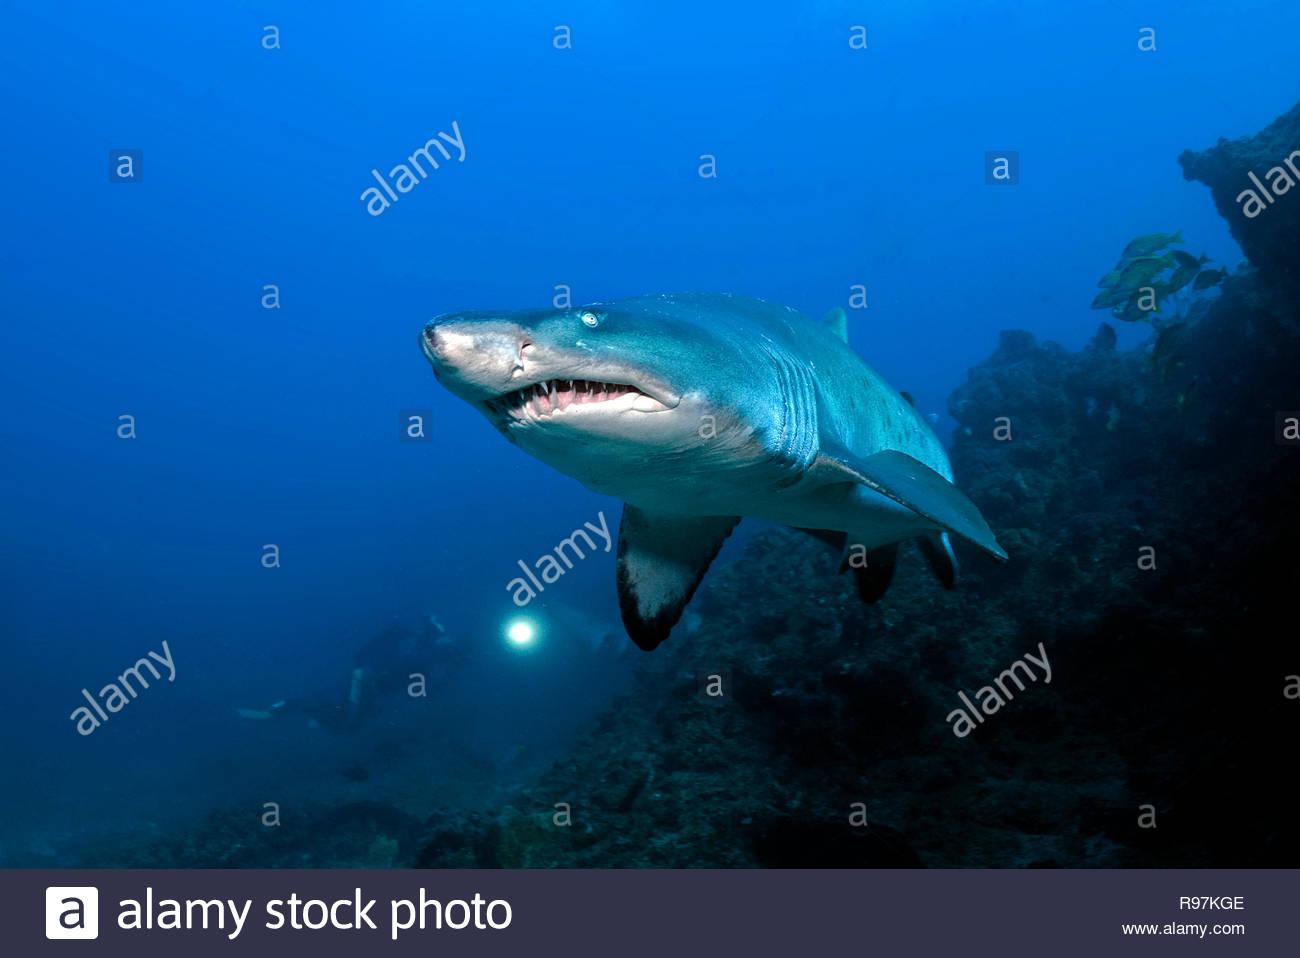 Taucher und Sandtigerhai (Carcharias taurus), Kwazulu-Natal, Südafrika | Scuba diver and Ragged tooth shark or Sandtiger shark (Carcharias taurus), Kw - Stock Image